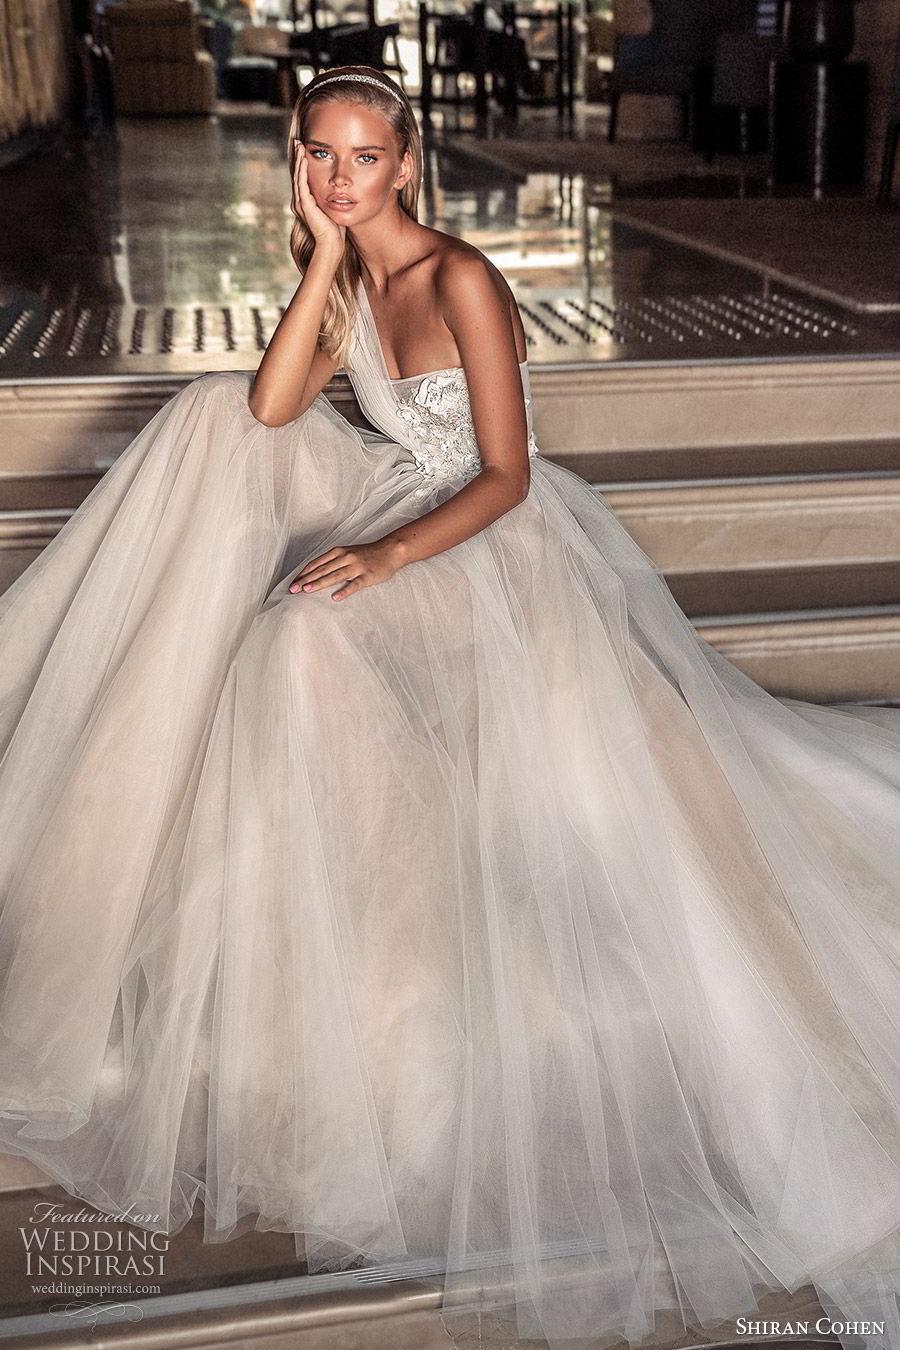 shiran cohen 2019 bridal one shoulder strap straight across embellished bodice a line ball gown wedding dress romantic elegant (11) mv